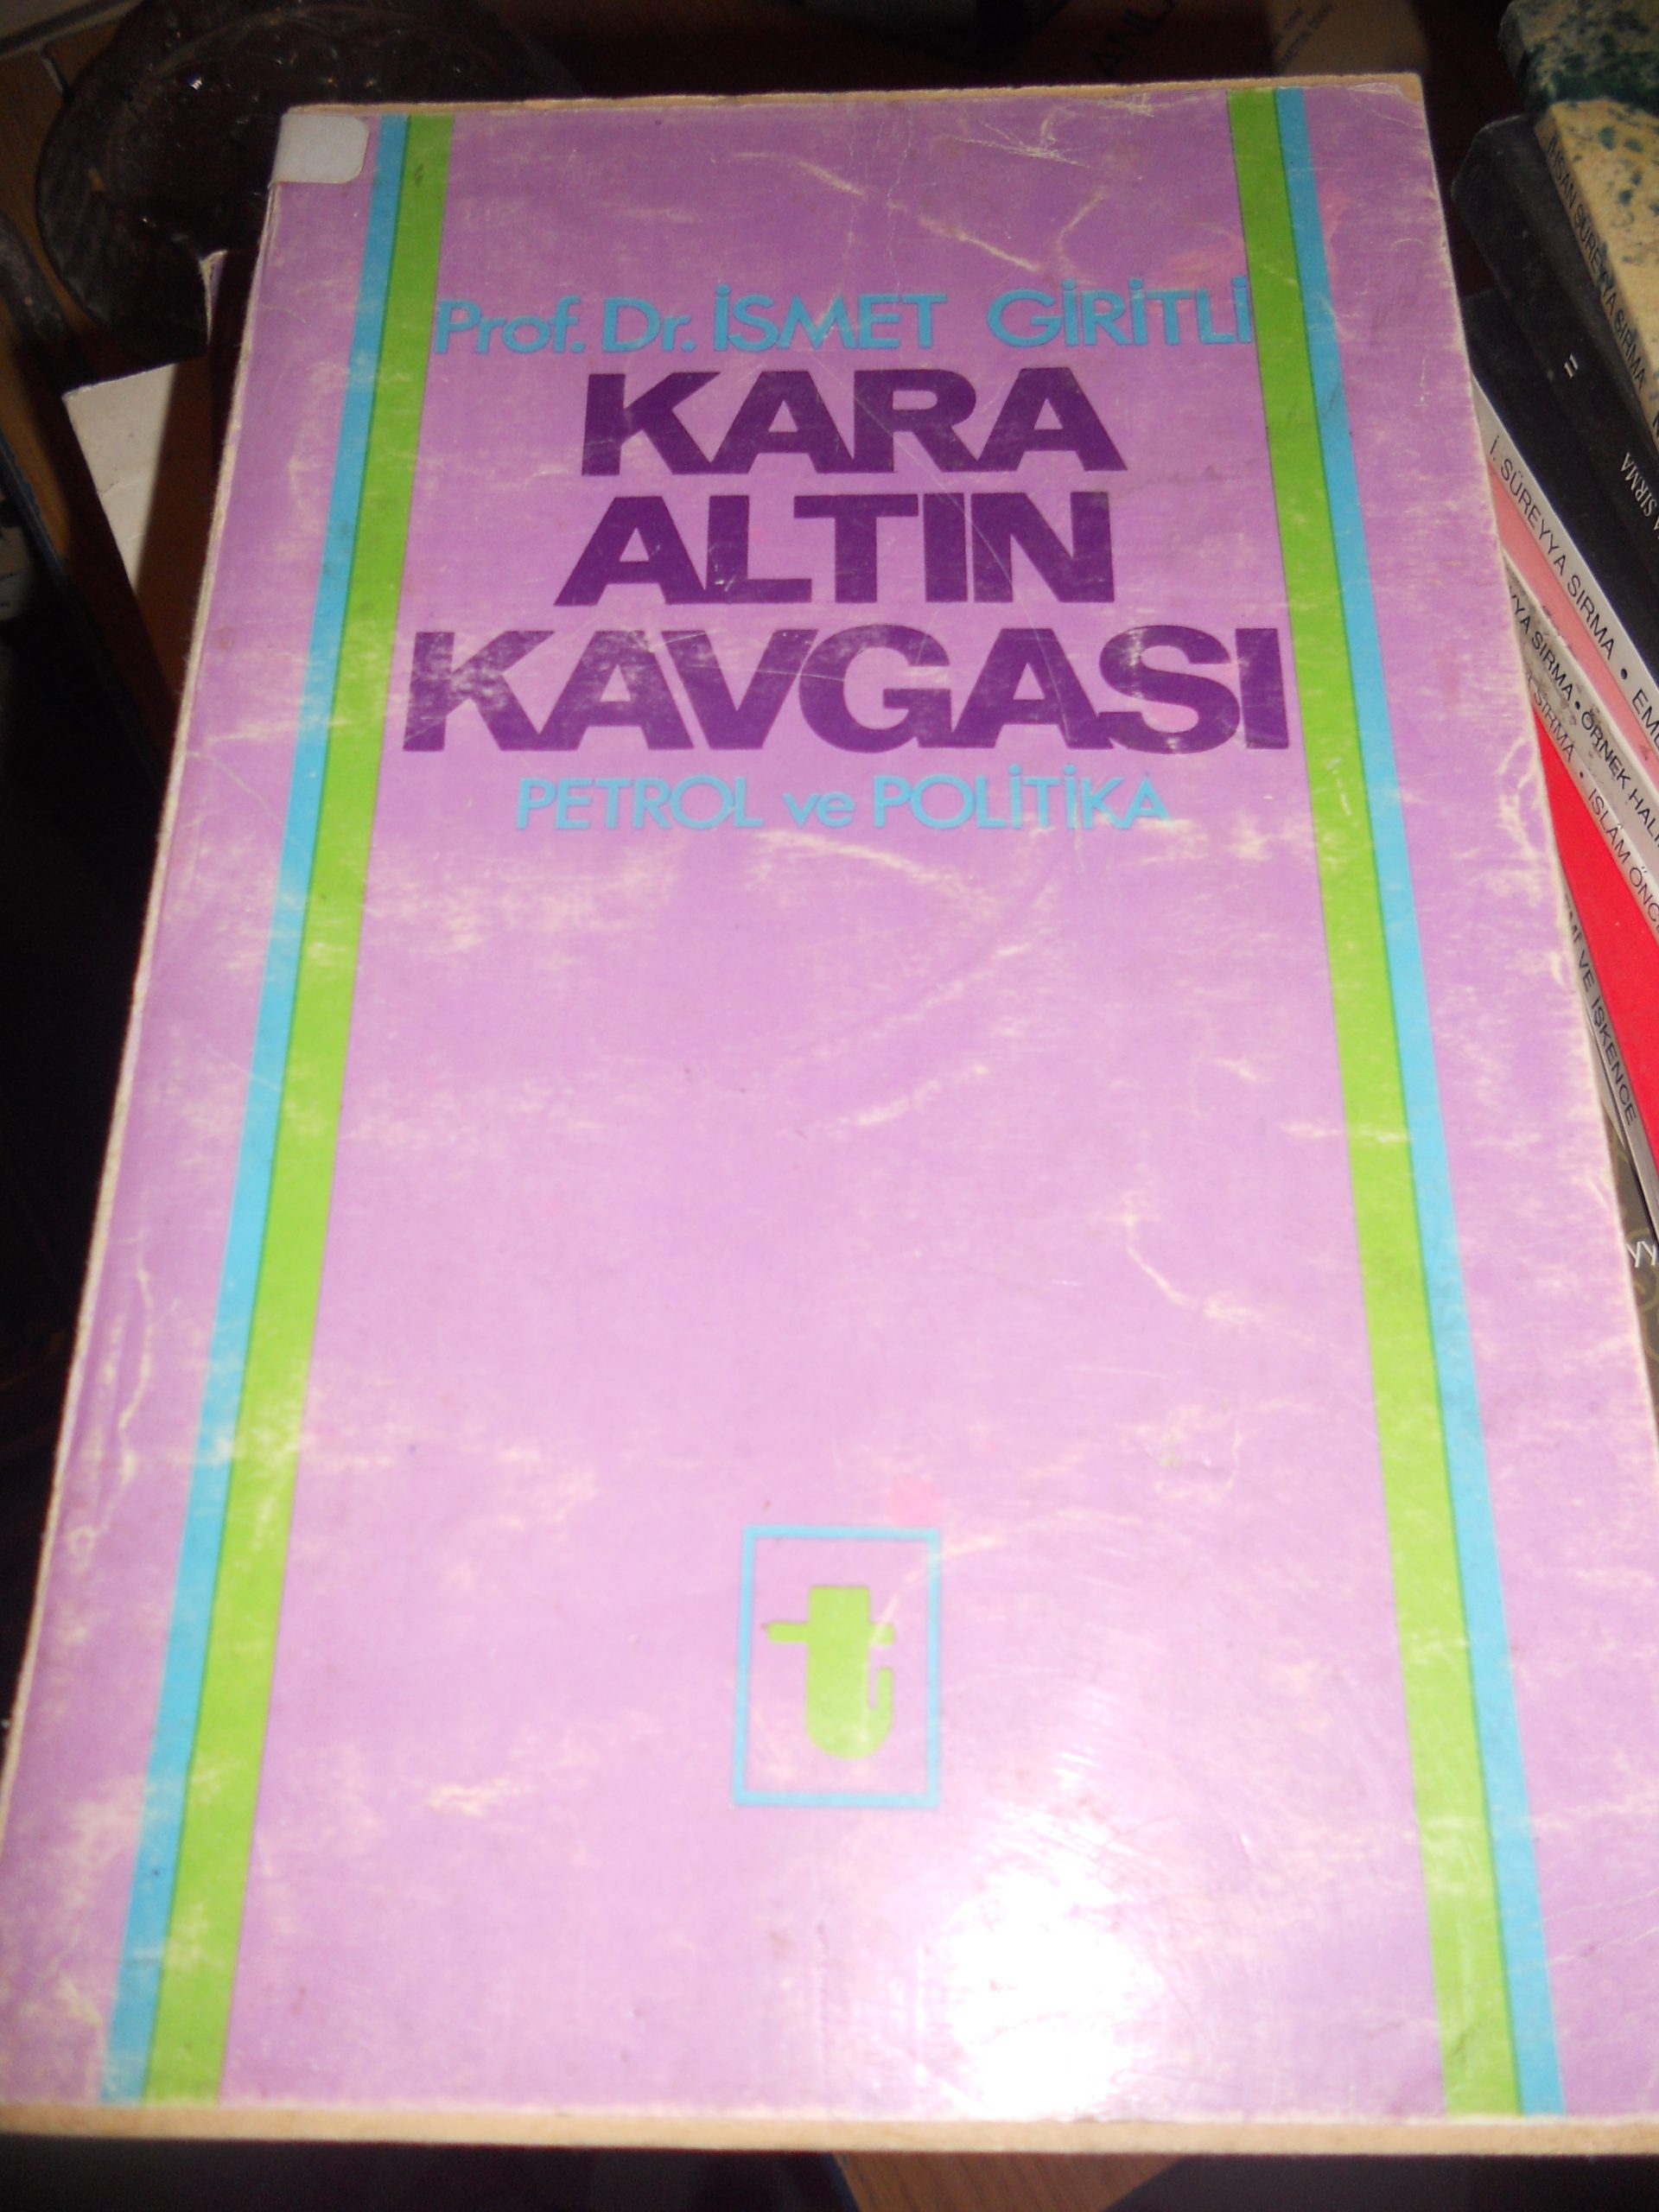 KARA ALTIN KAVGASI(Petrol ve Politika) Prof.Dr.İsmet GİRİTLİ/10TL